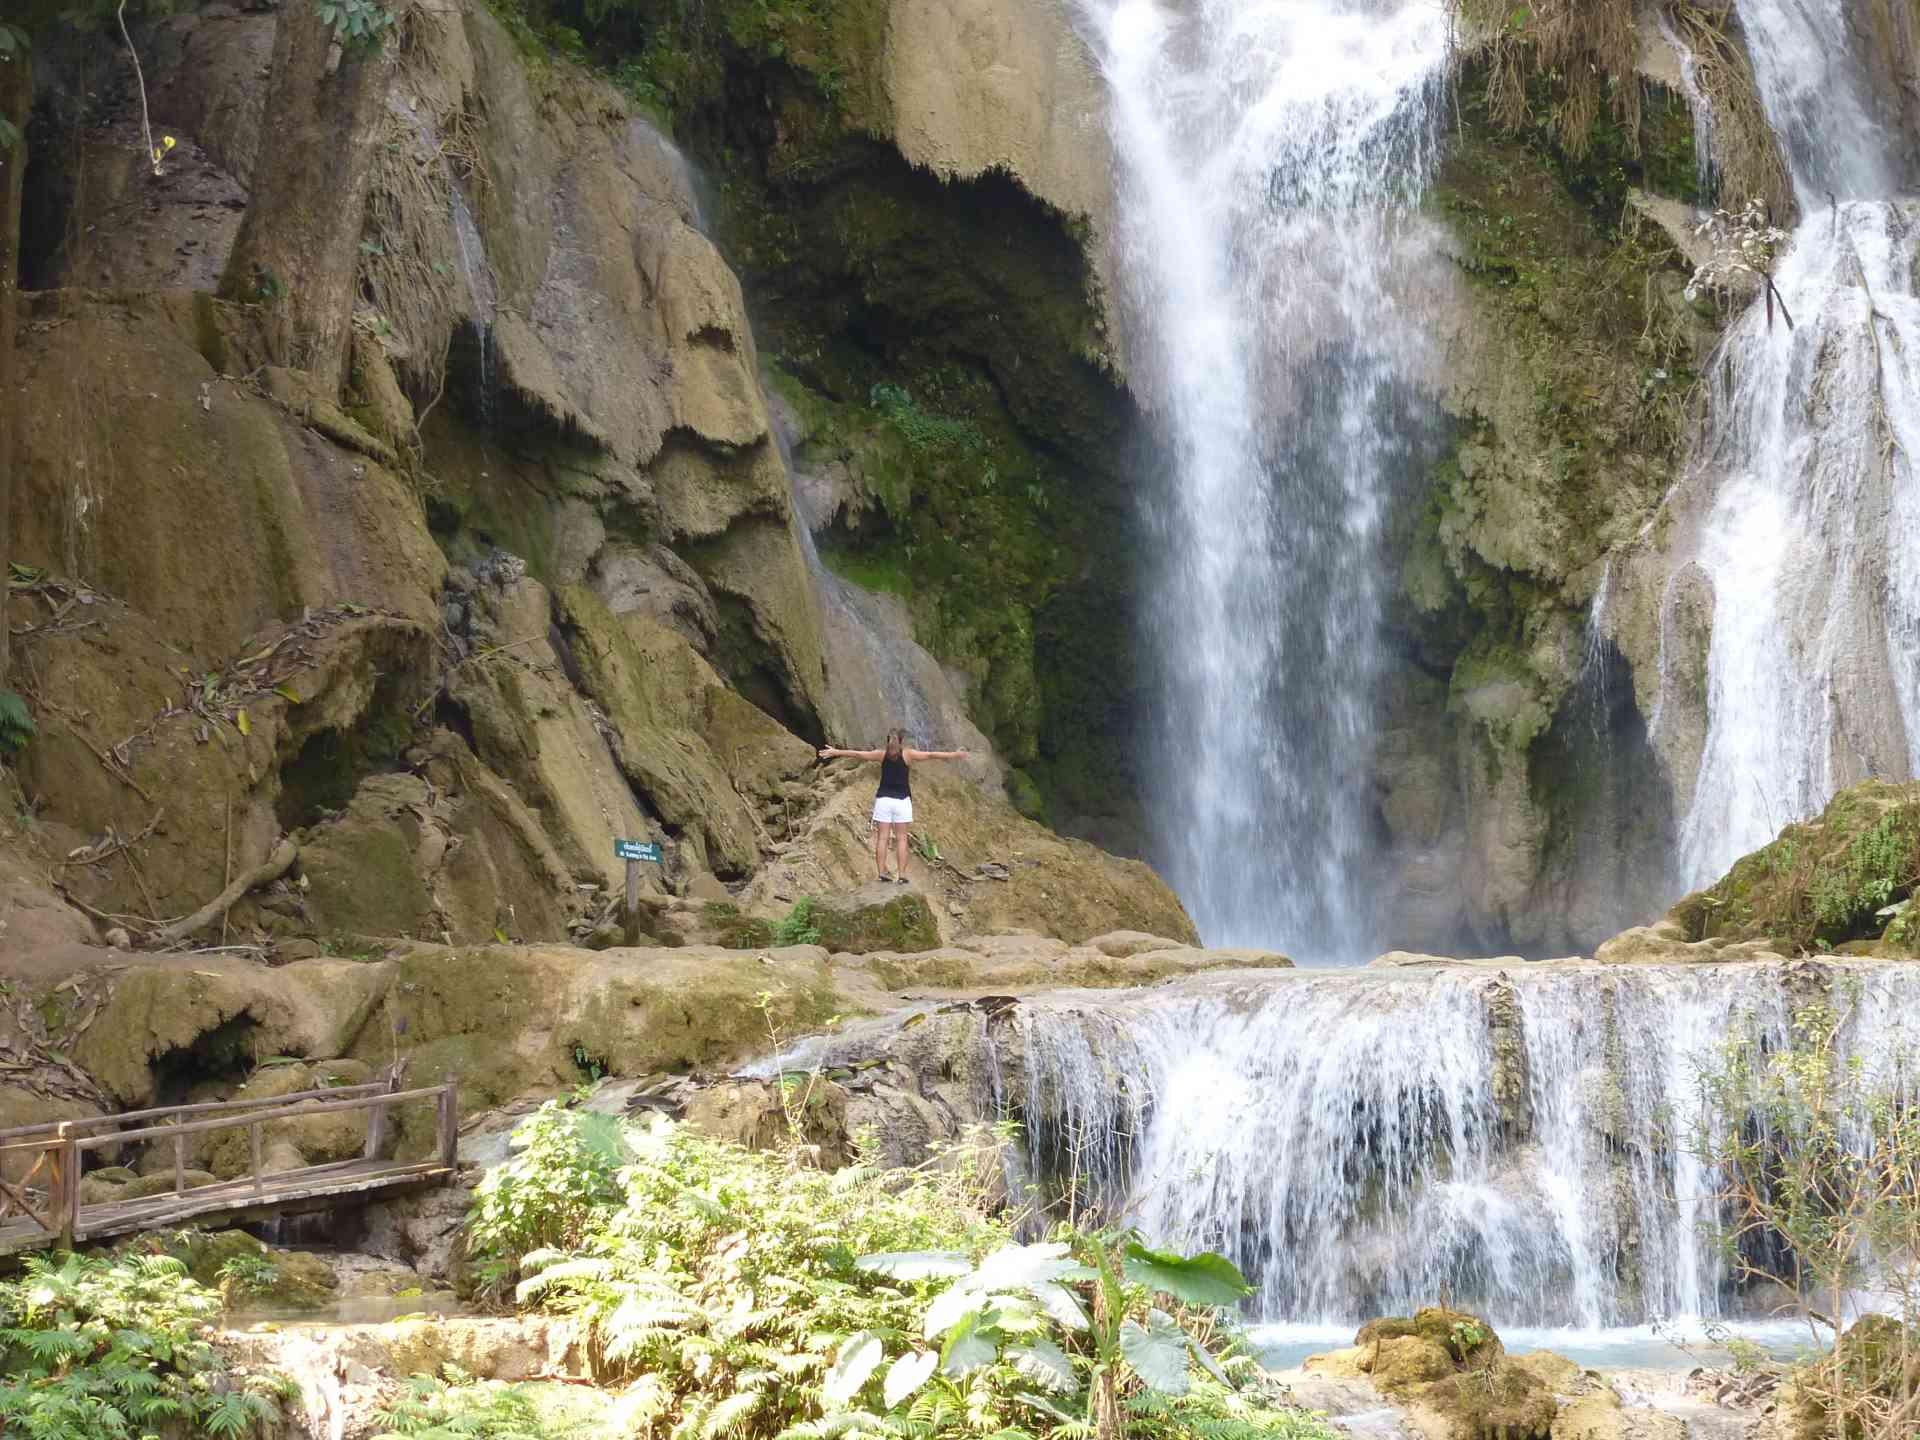 Charismatic Laos